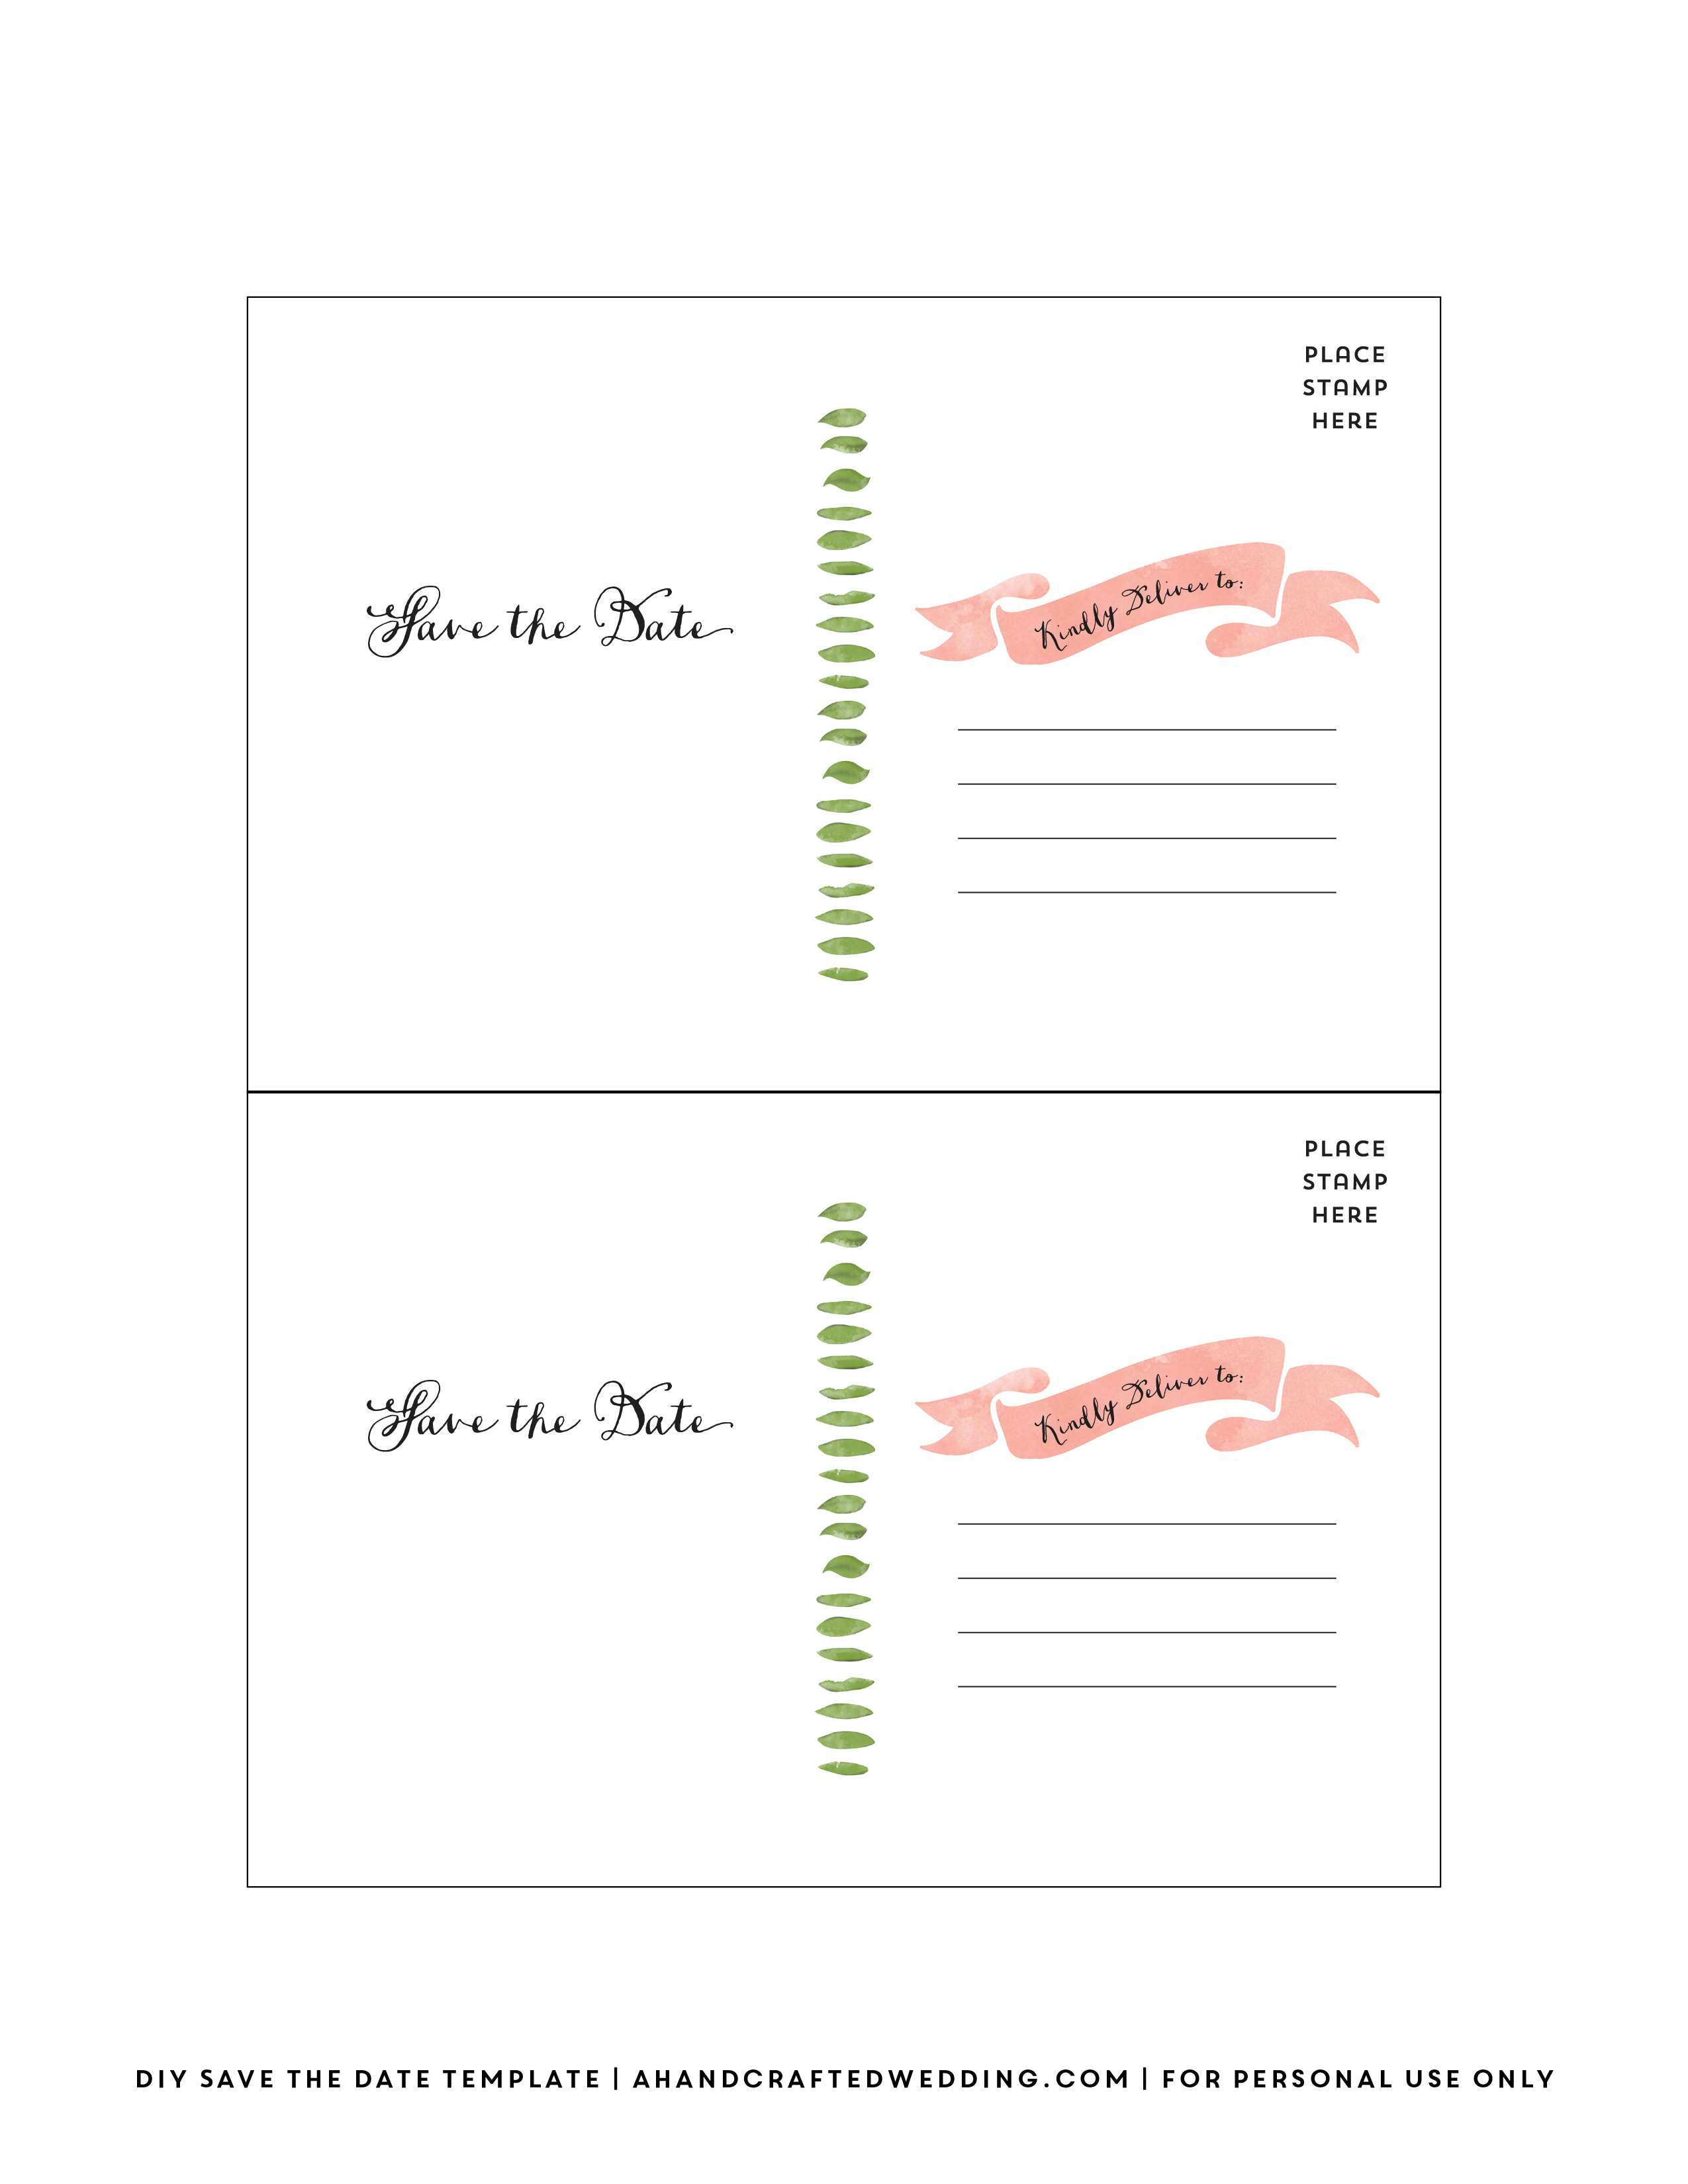 Templates Printable Free Postcards Postcard Template Save The Date